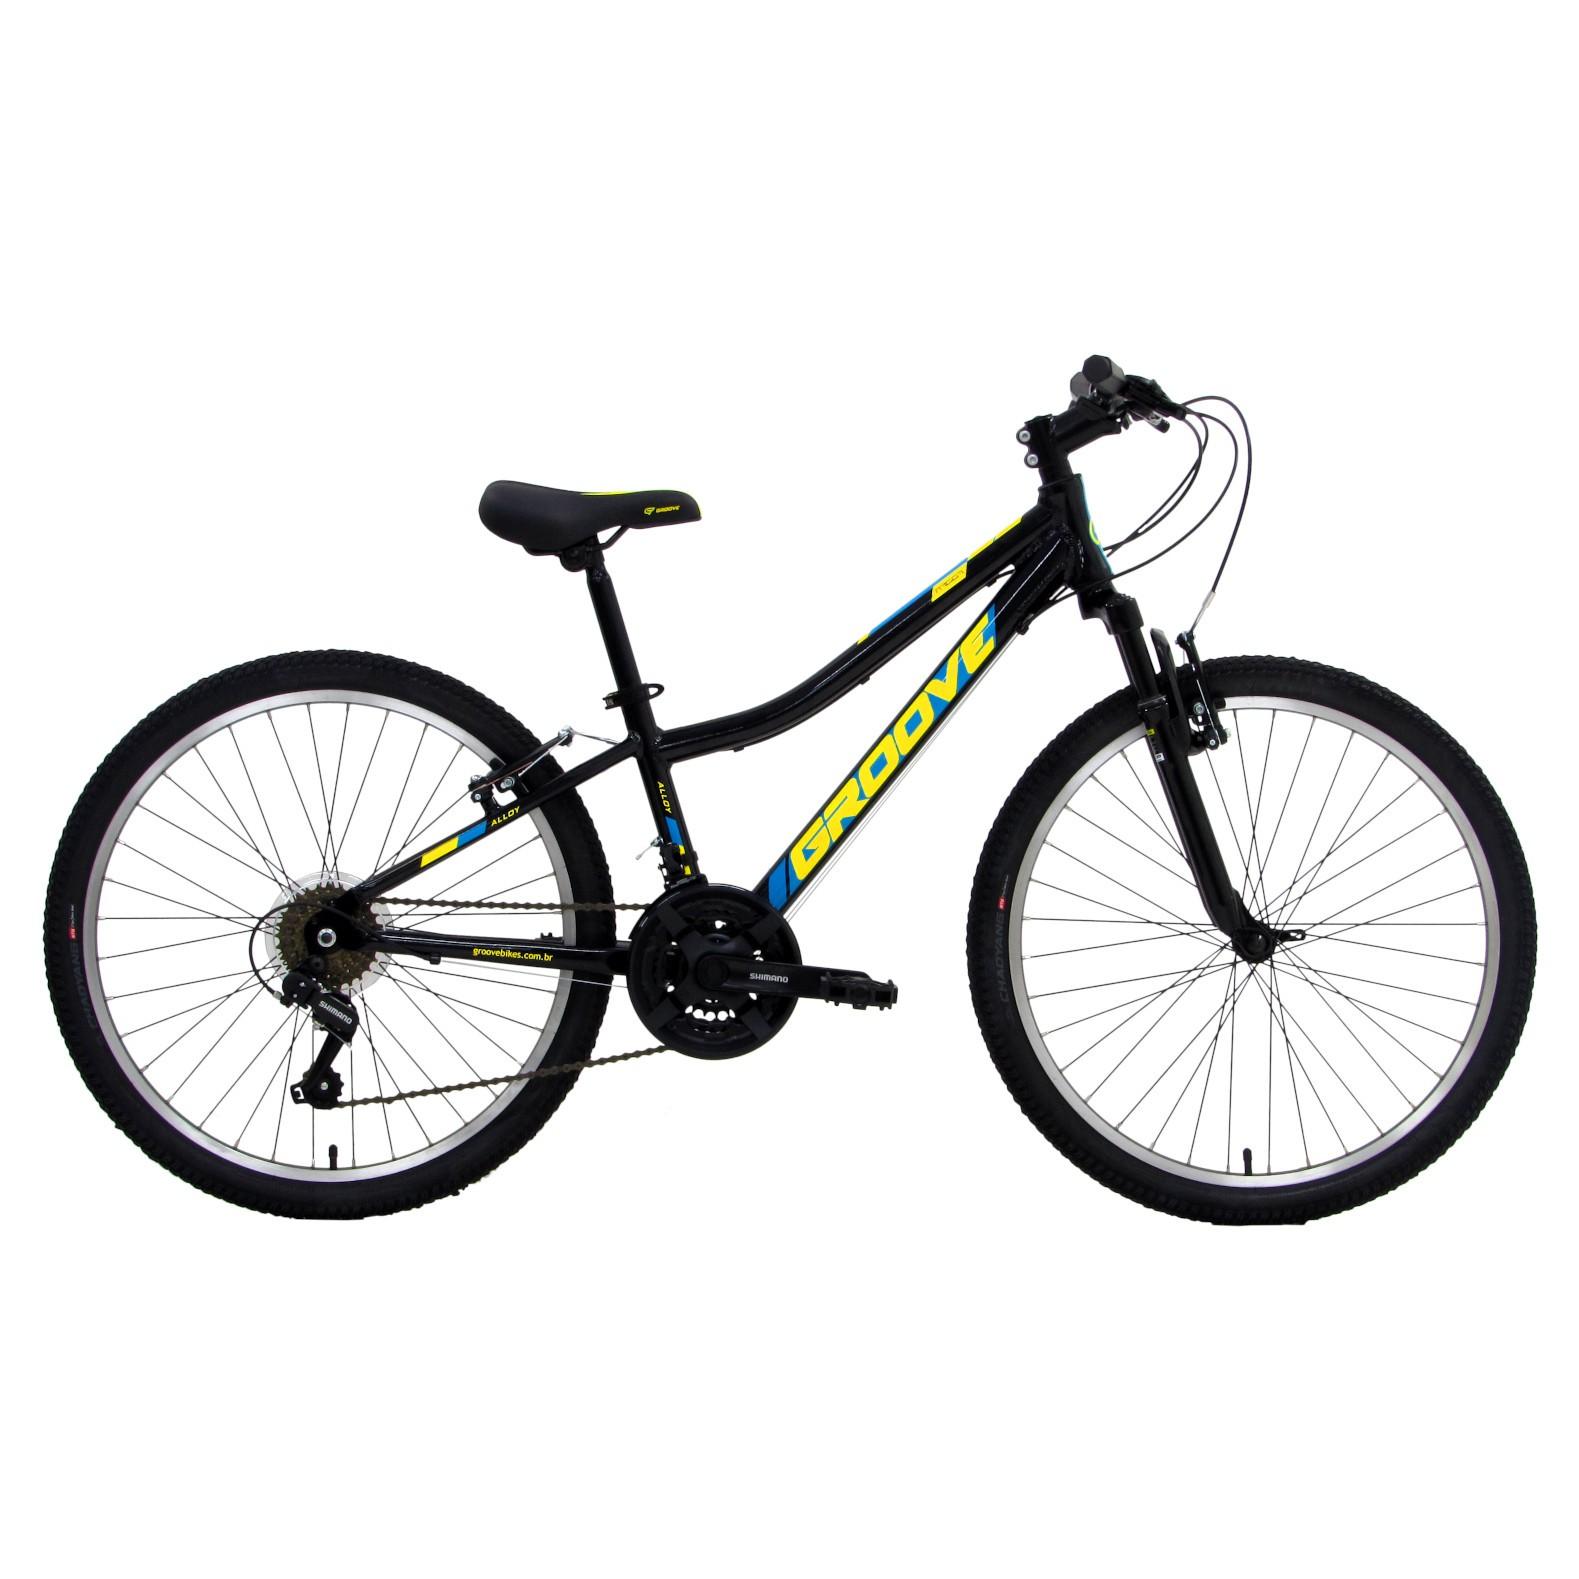 Bicicleta Infantil Groove Ragga Alloy Aro 24 2021